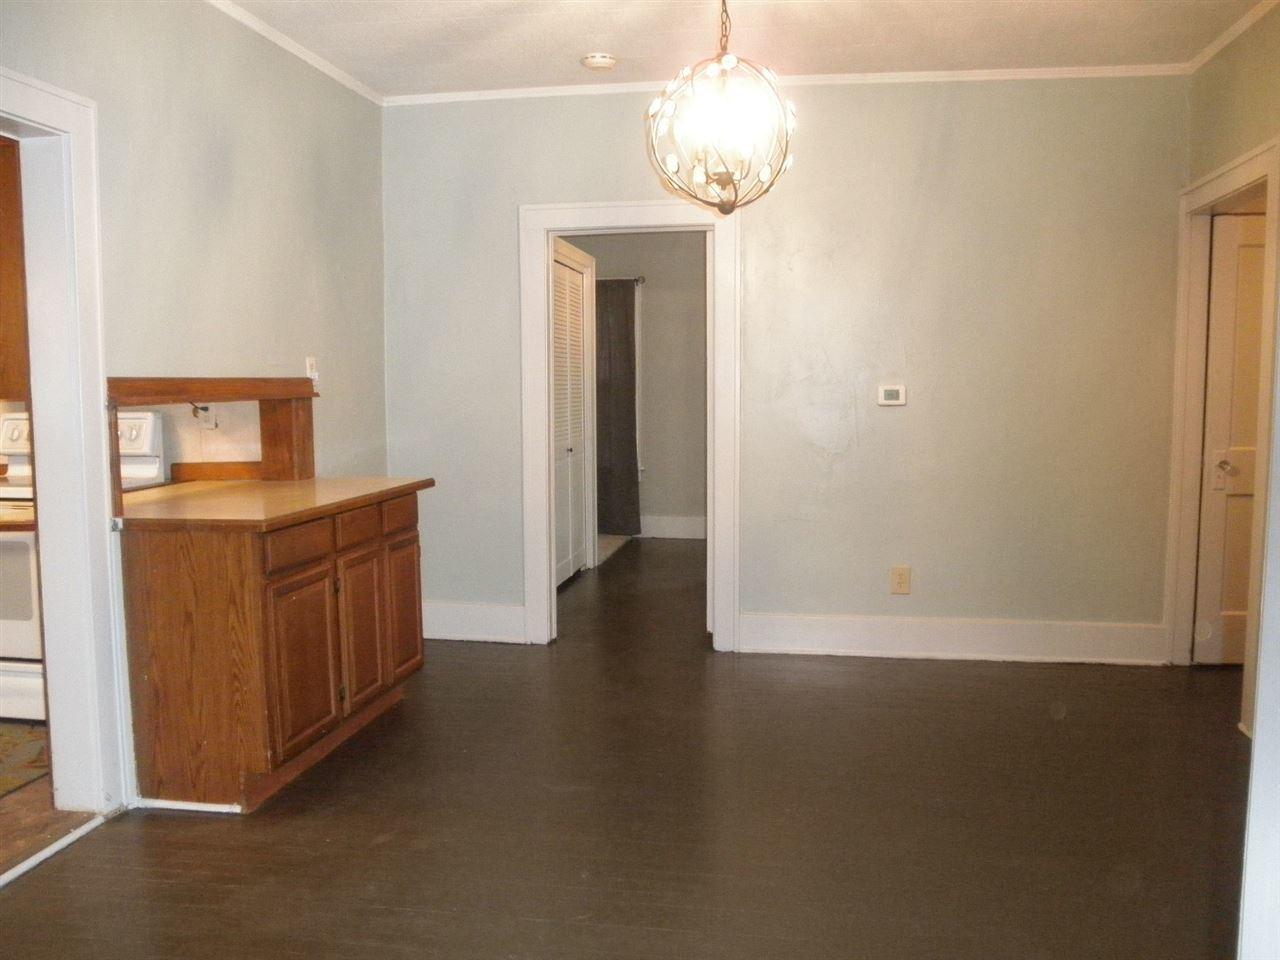 #century21groupone,#homesforsaleponcacity,#poncacityrealestate | 840 N Birch  Ponca City, OK 74601 18